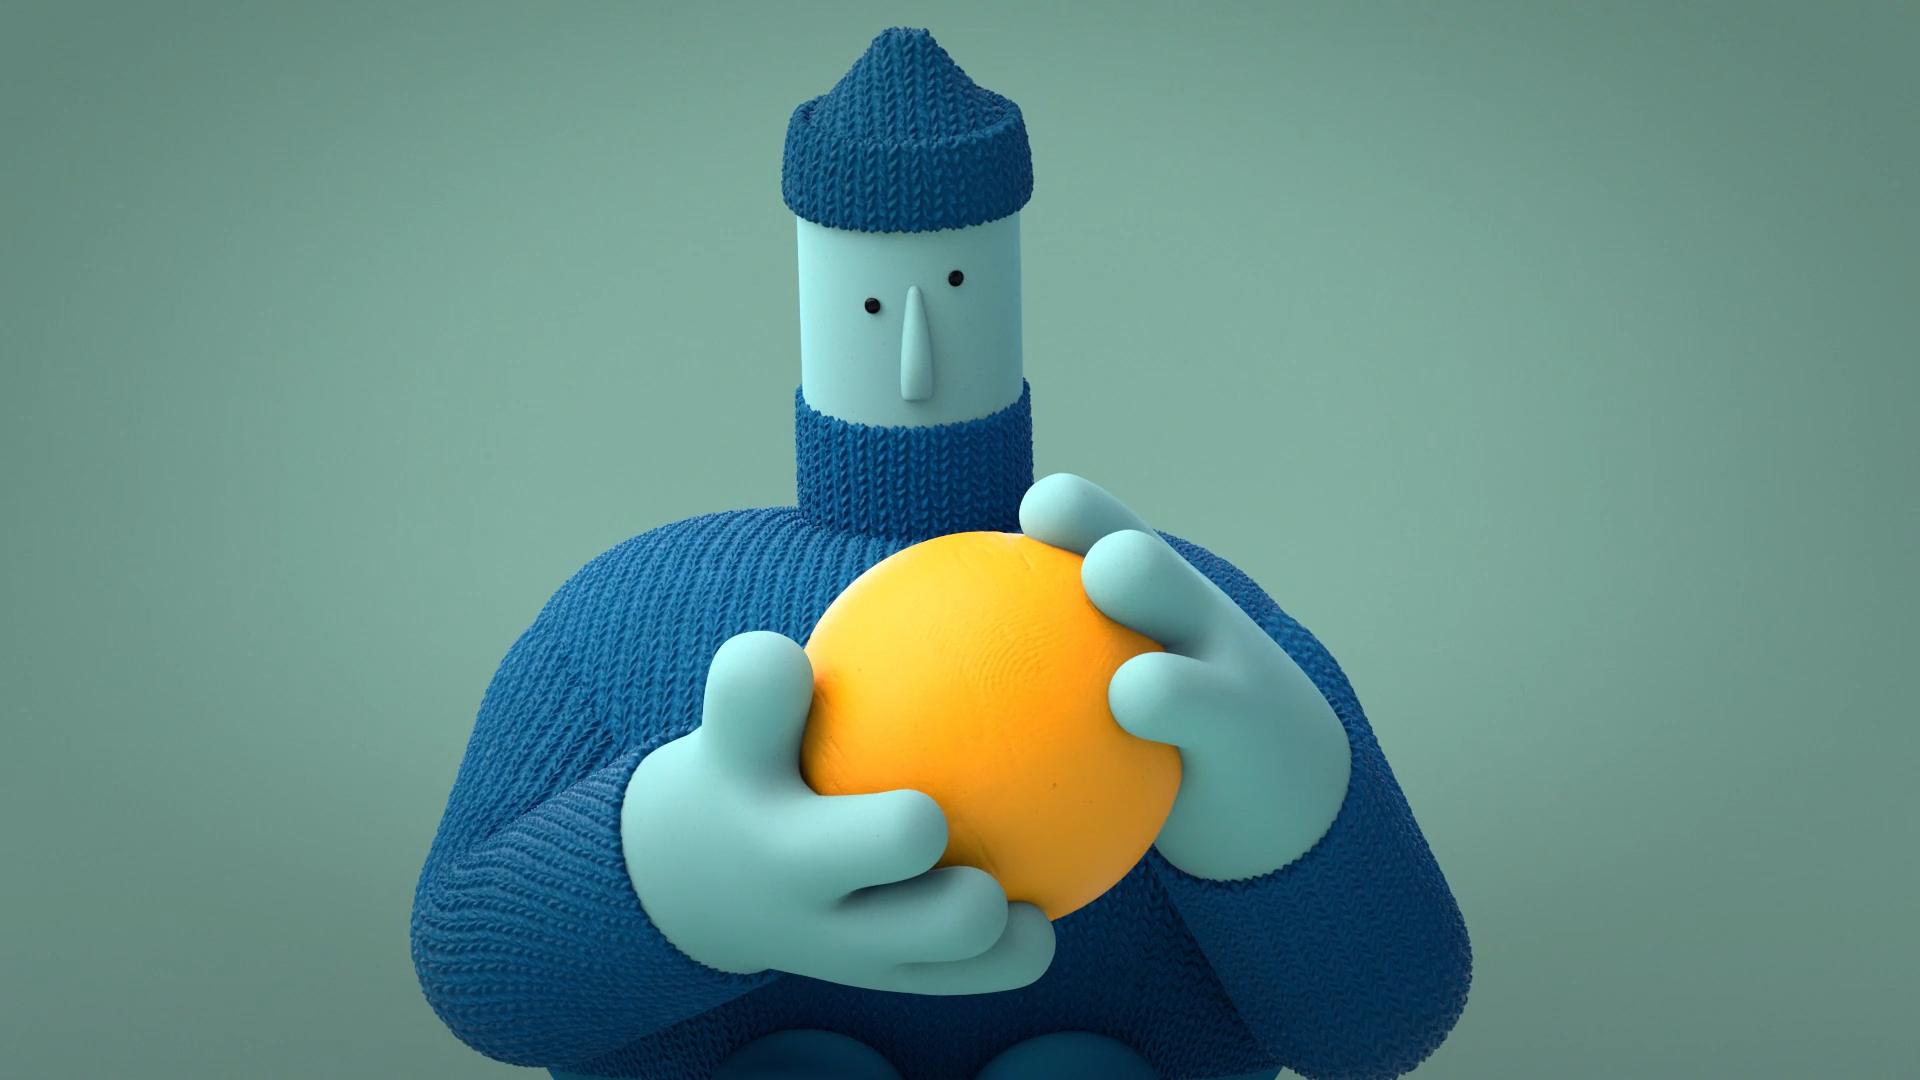 Animated Short: The Idea